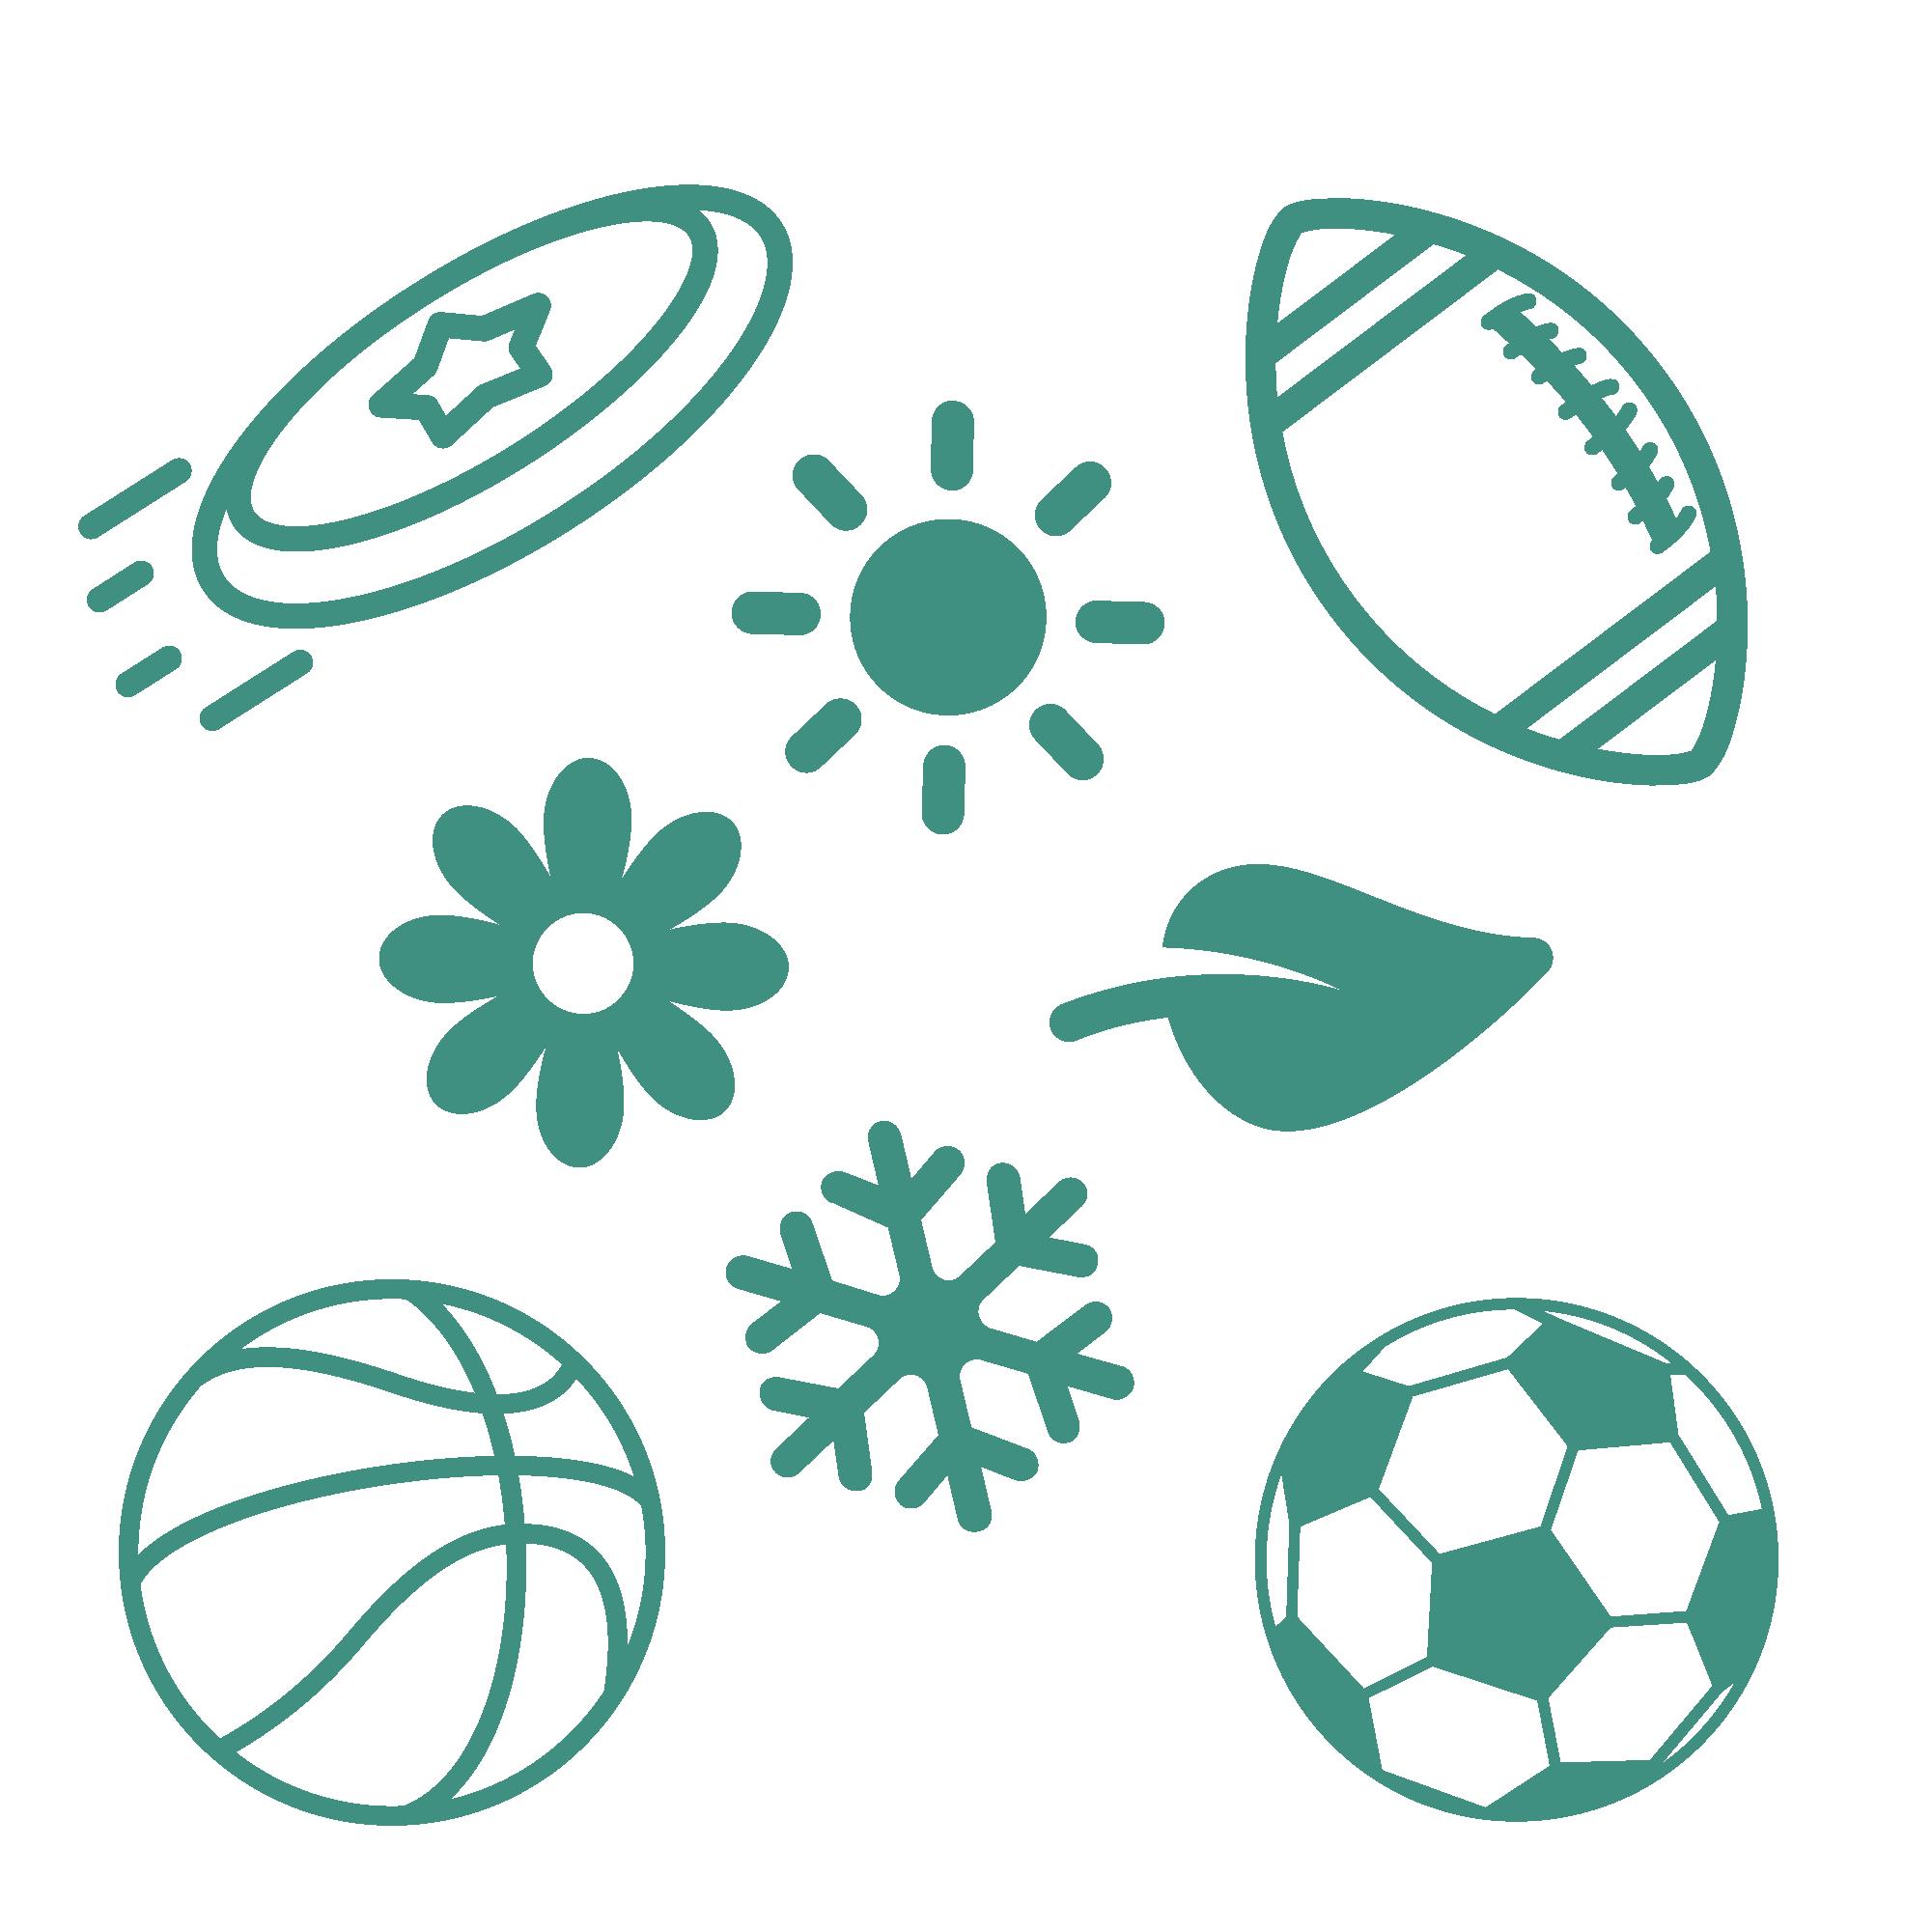 An icon depicting seasonal sports